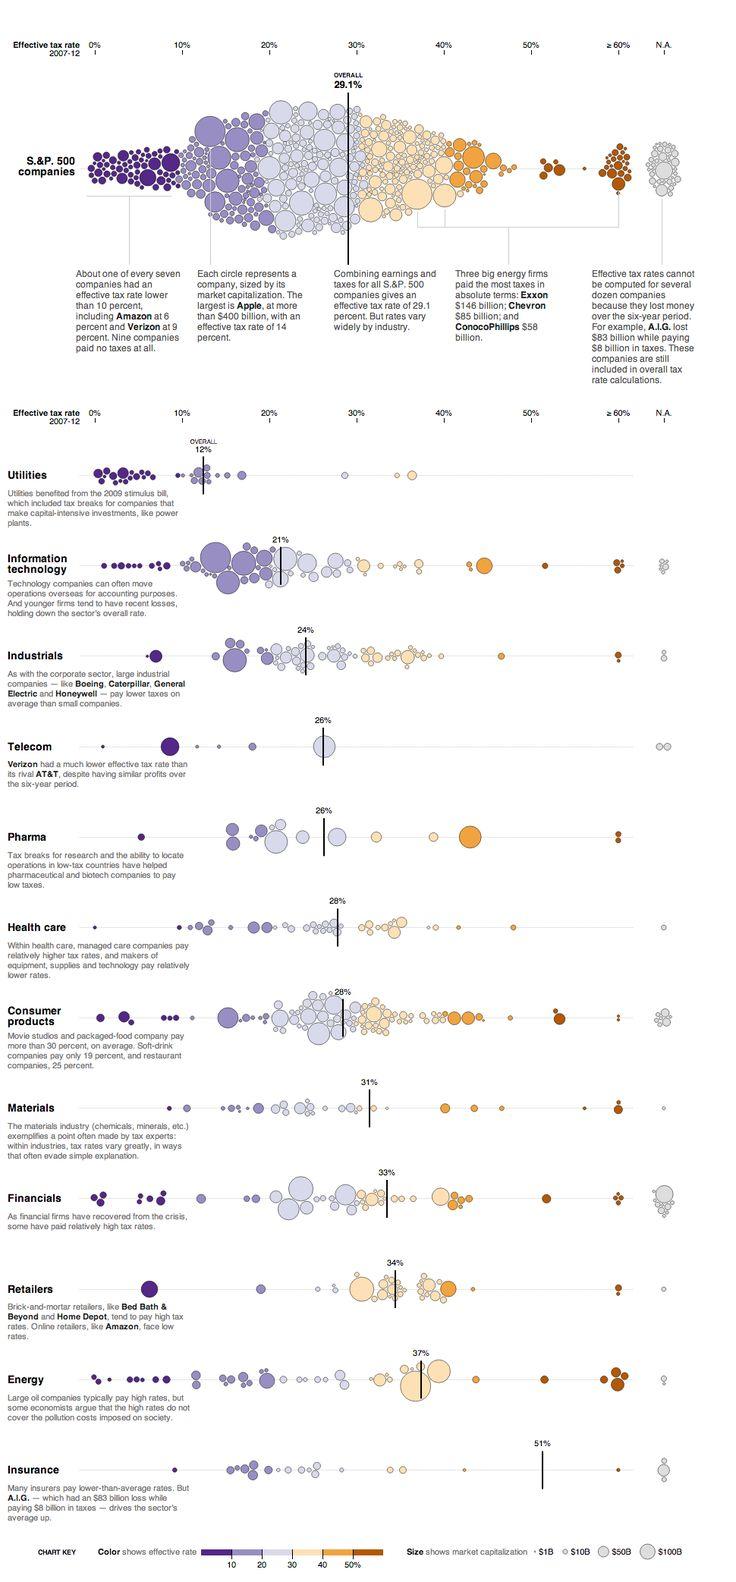 Across U.S. Companies, Tax Rates Vary Greatly...